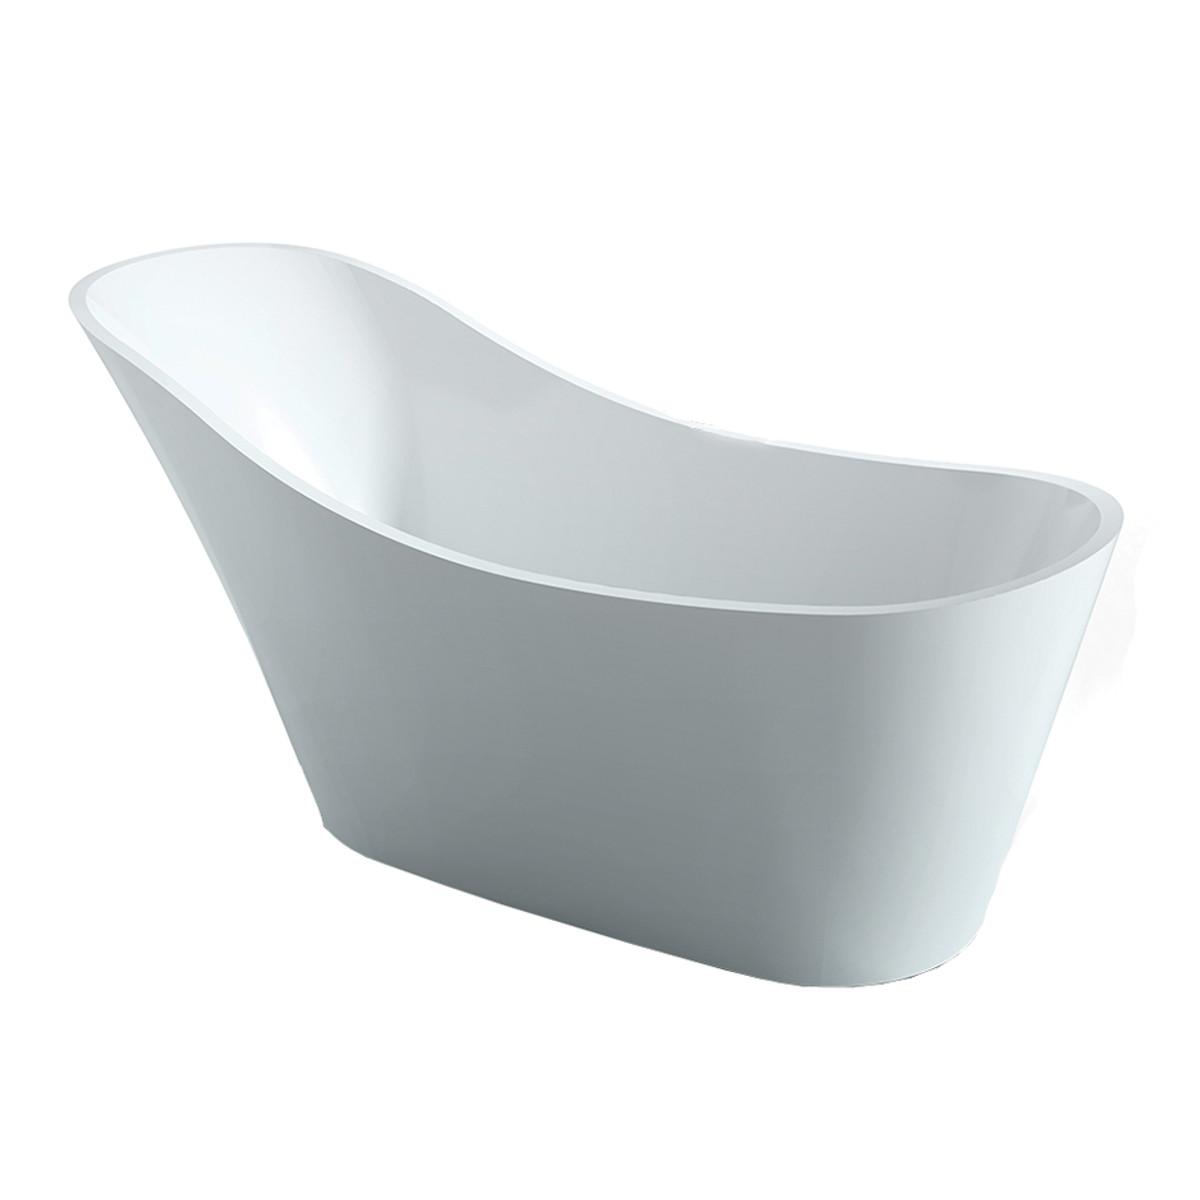 "TUB19 Flou Bathtub 67""W"